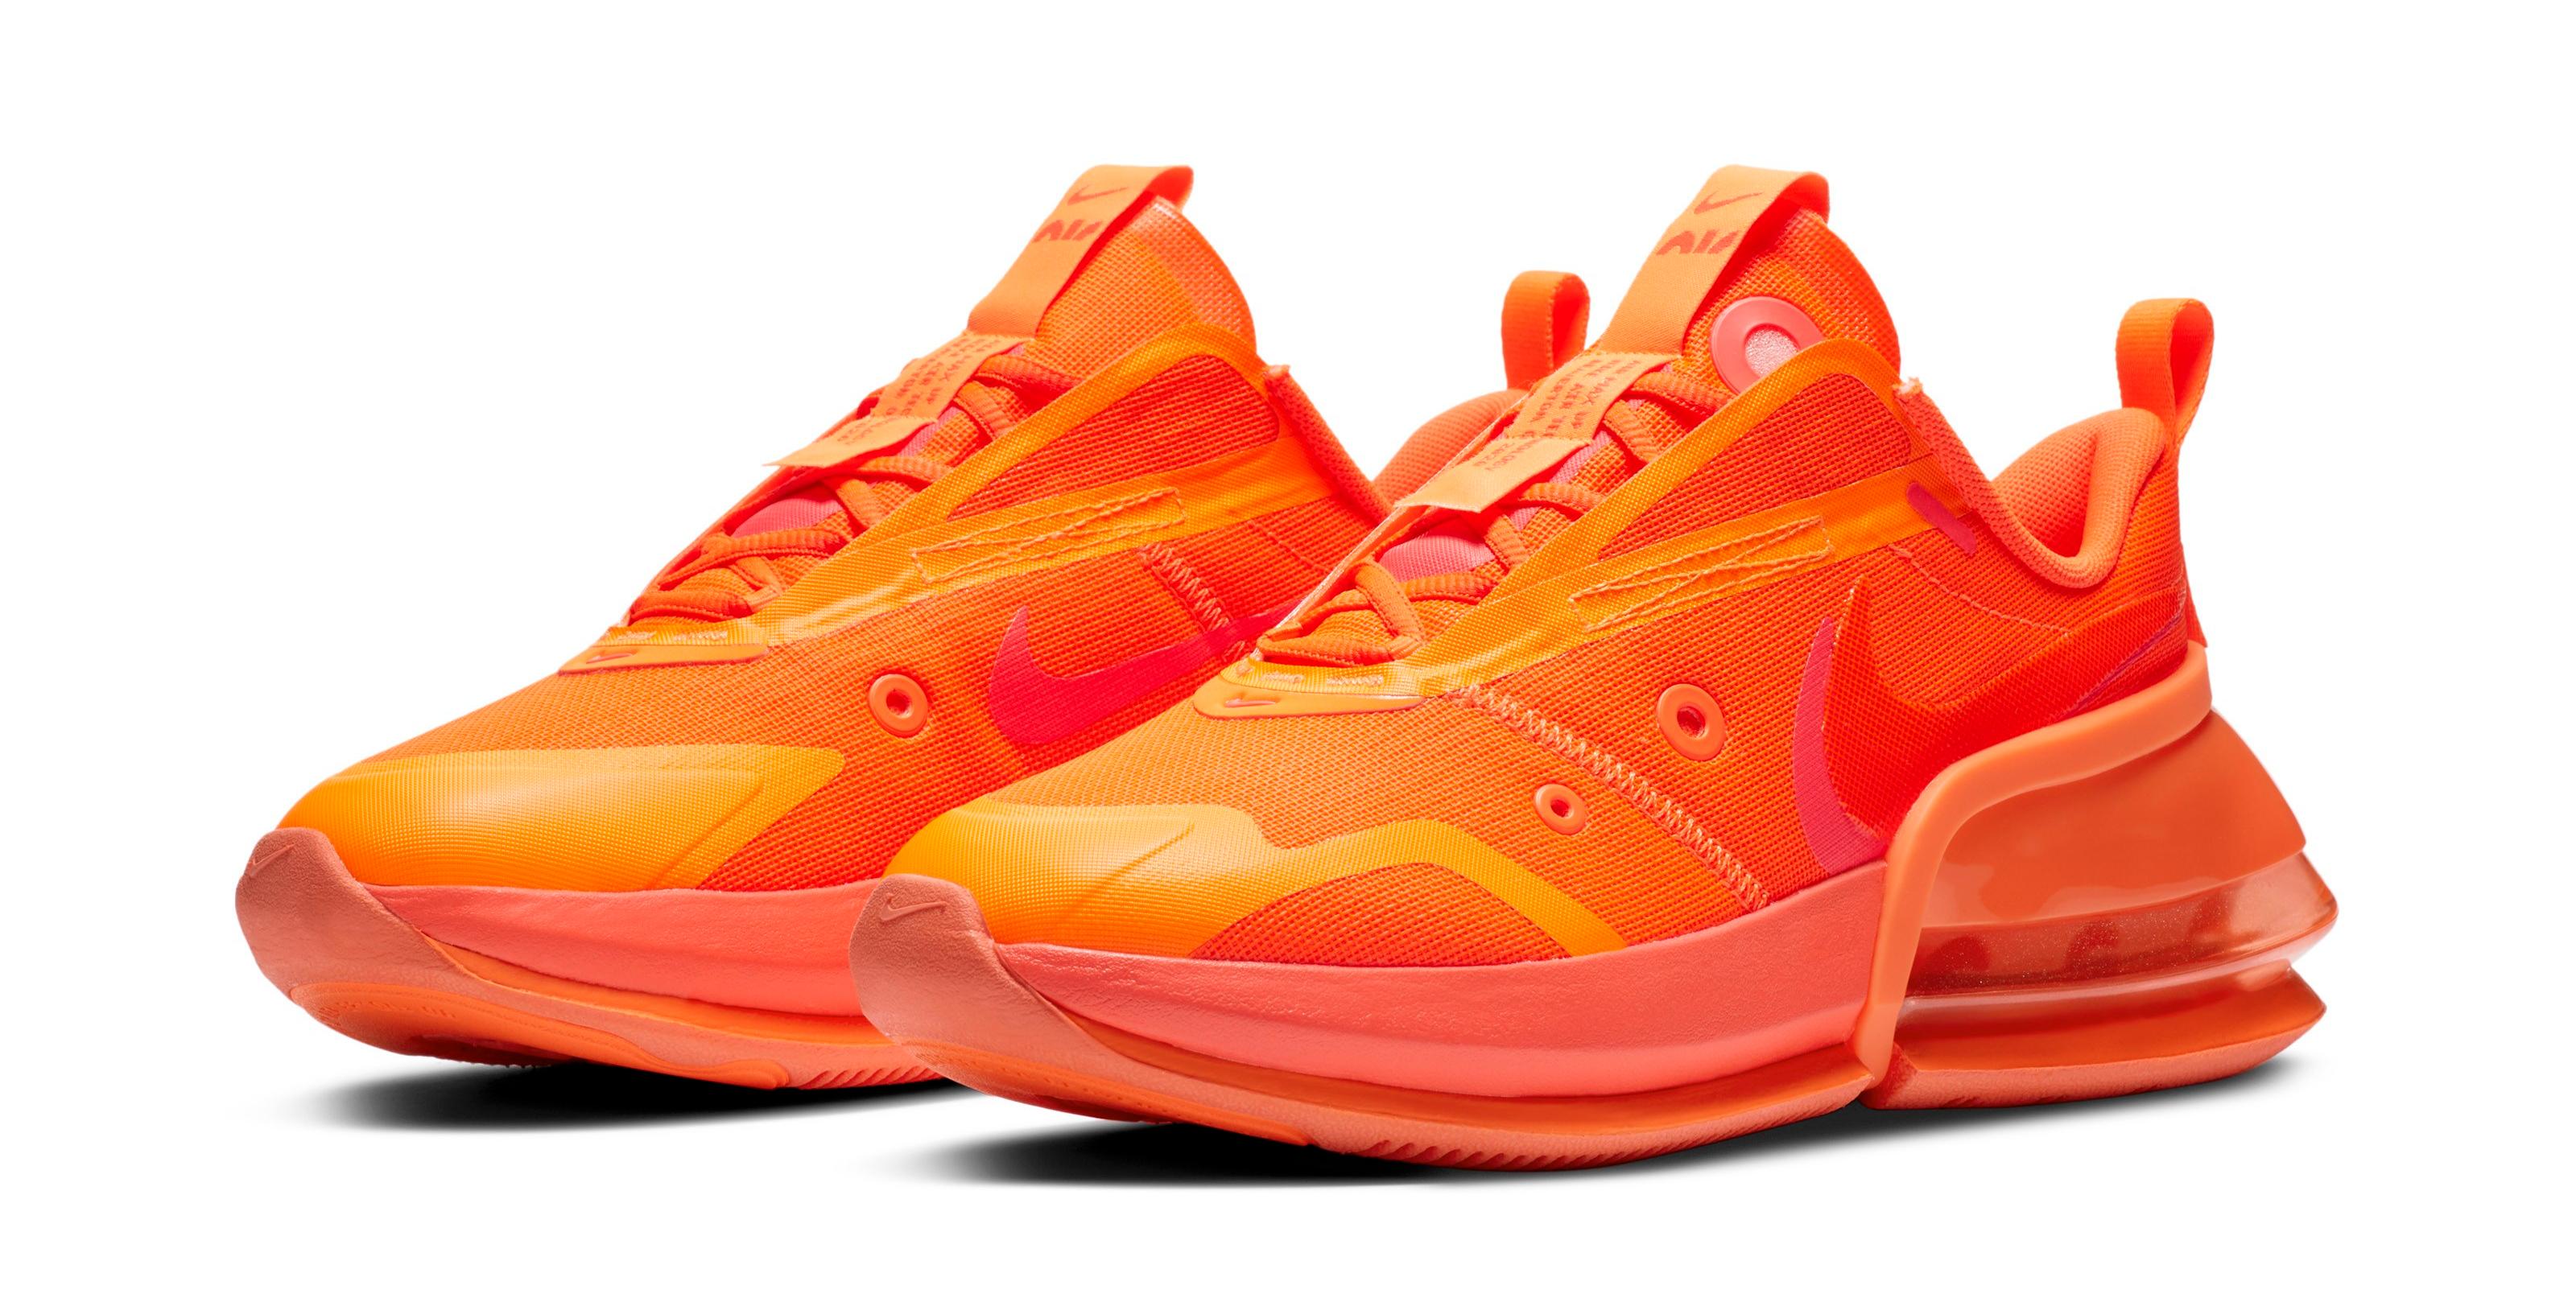 Nike_Sportswear_FA20_W_Air_Max_Up_07_96862